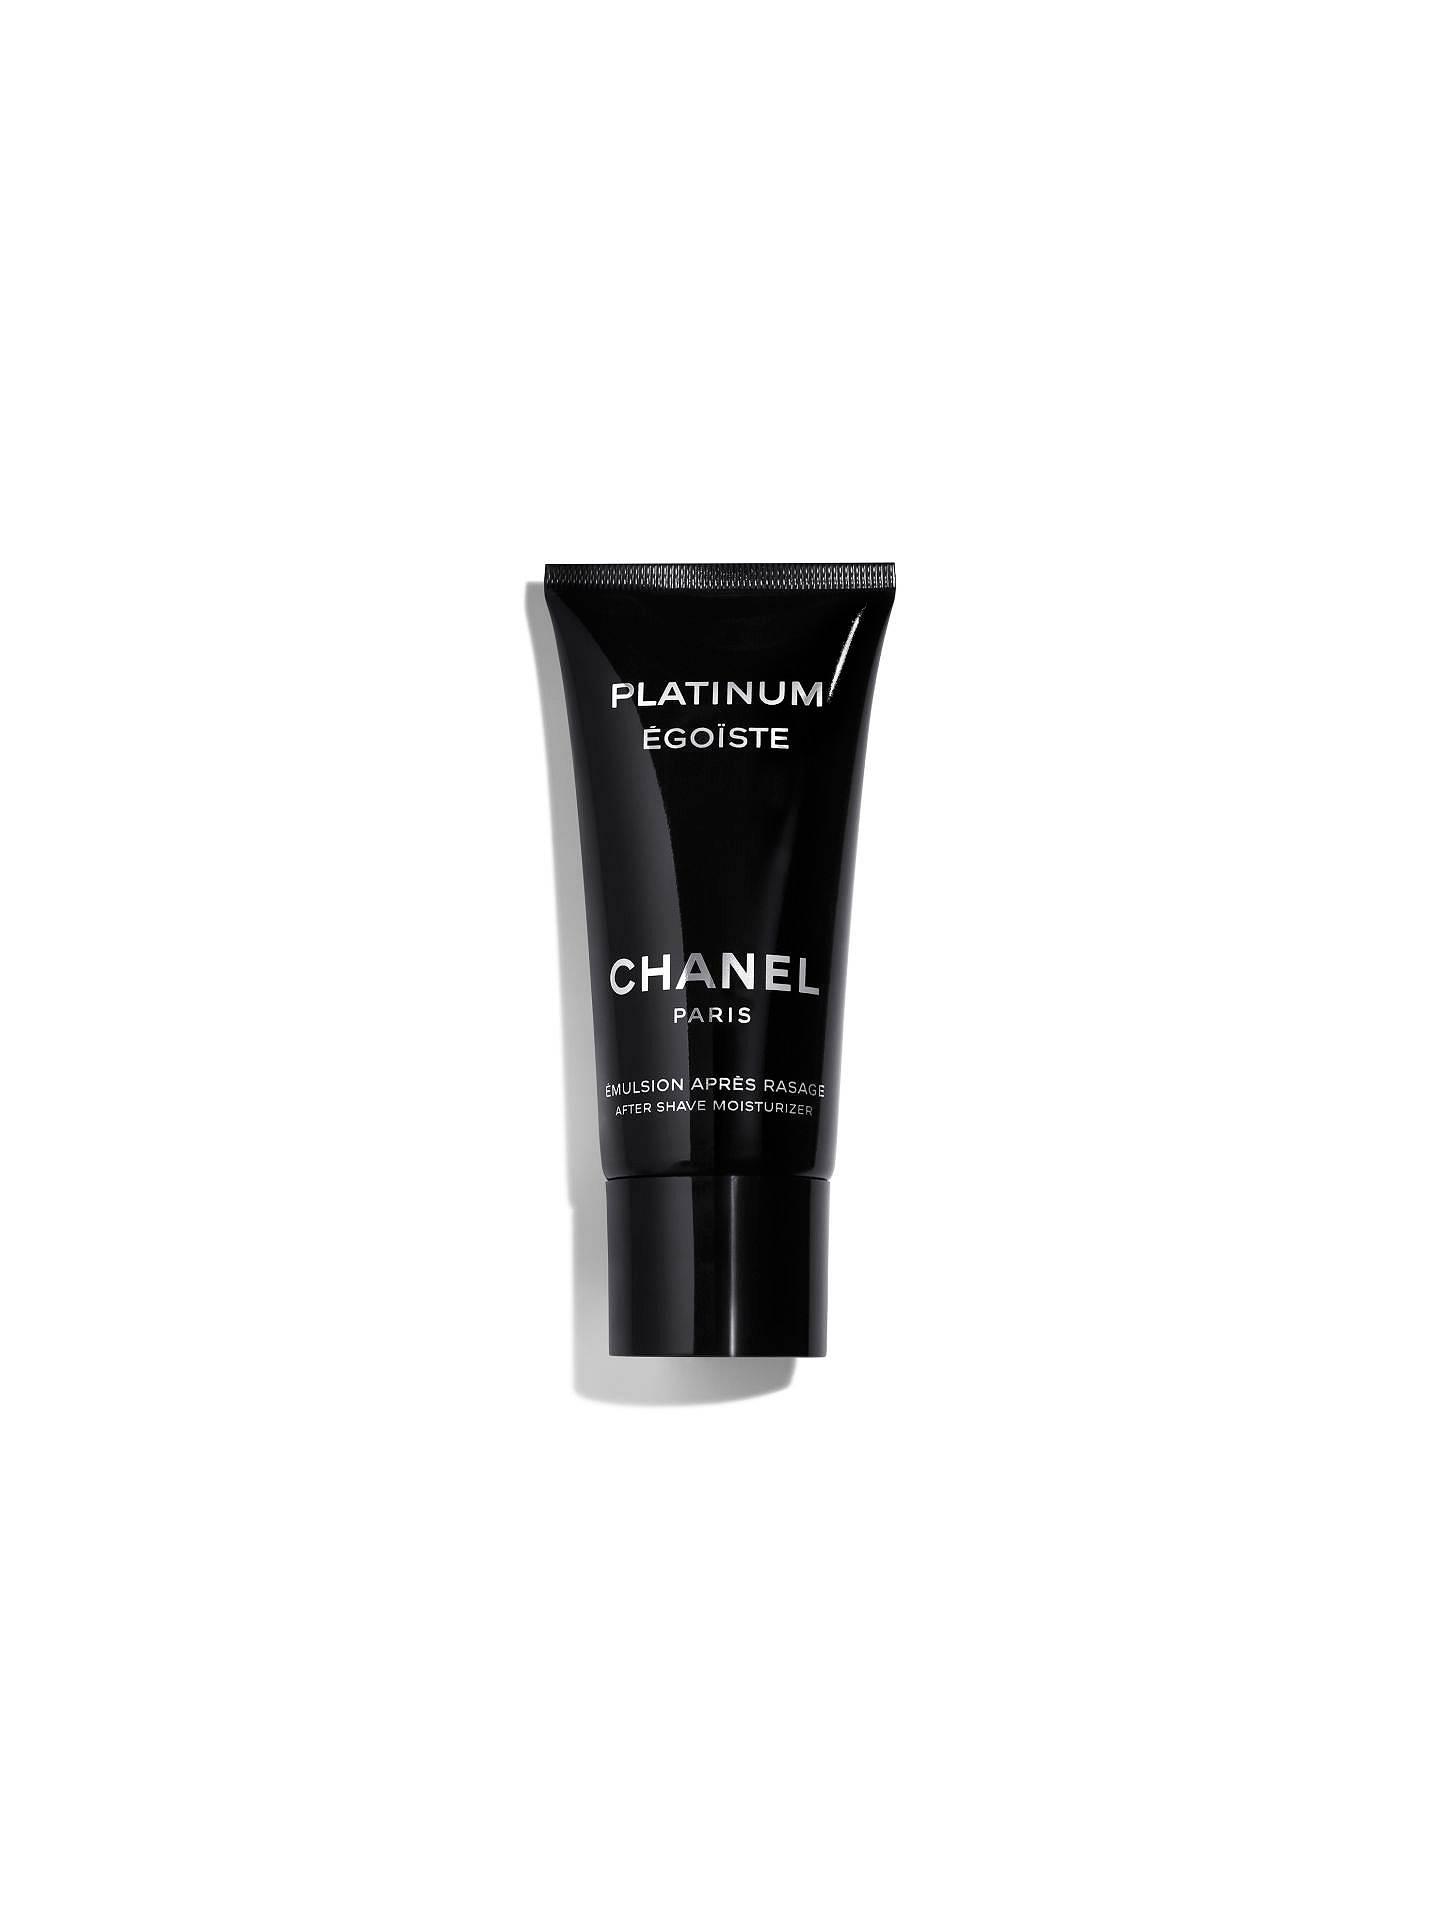 BuyCHANEL PLATINUM ÉGOÏSTE After-Shave Moisturiser Online at johnlewis.com 7ca309c94d68